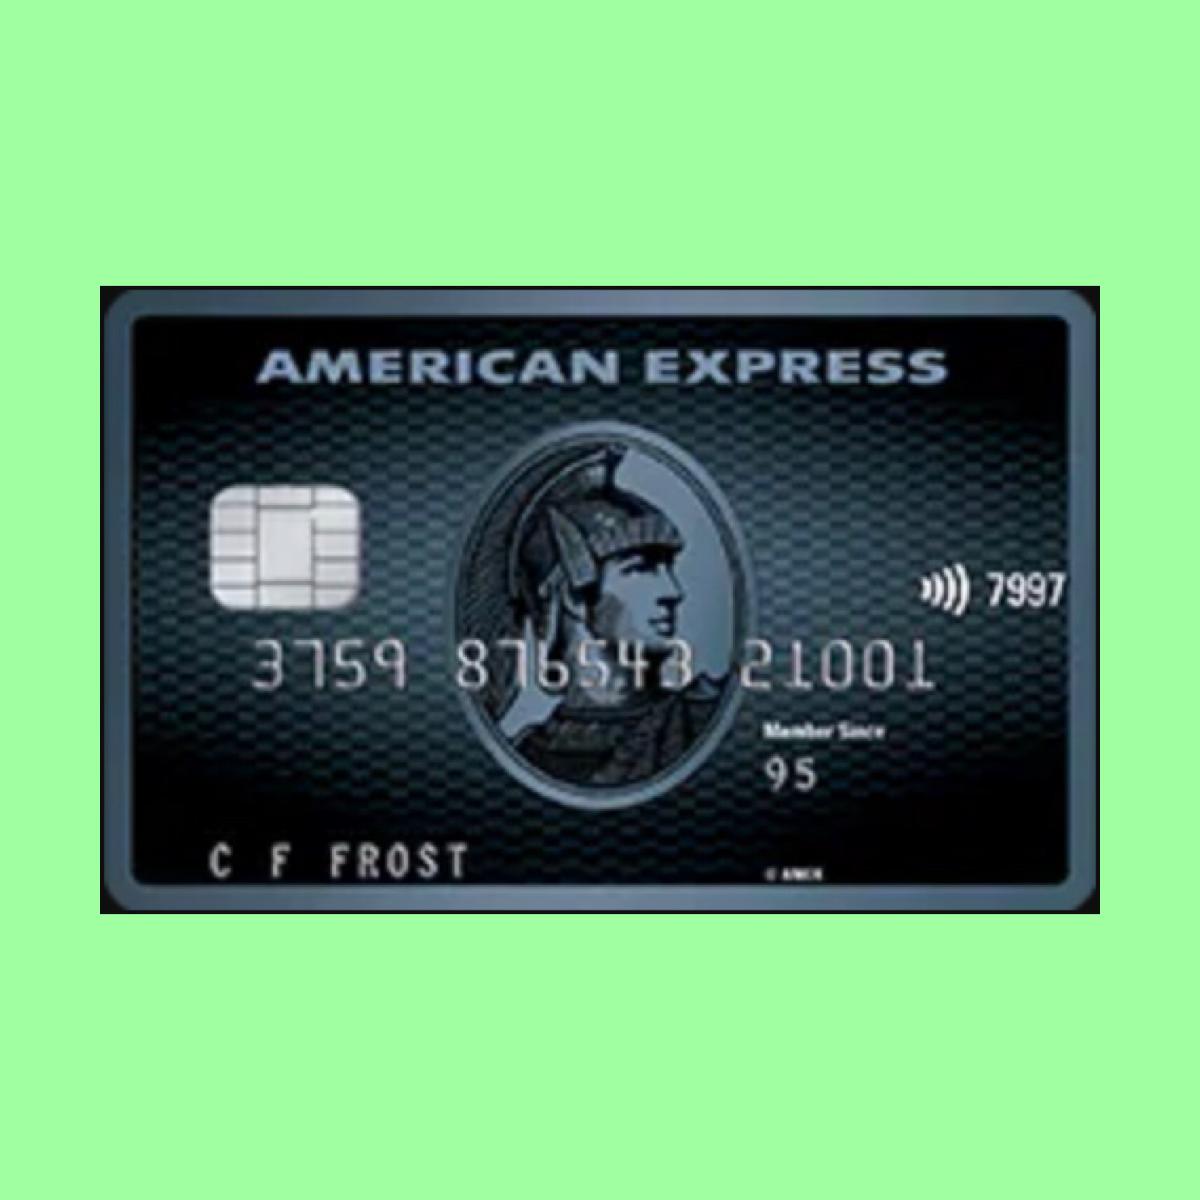 Amex Explorer Card Calculate Compare Point Calculator Credit Card Fees American Express Card Reward Card